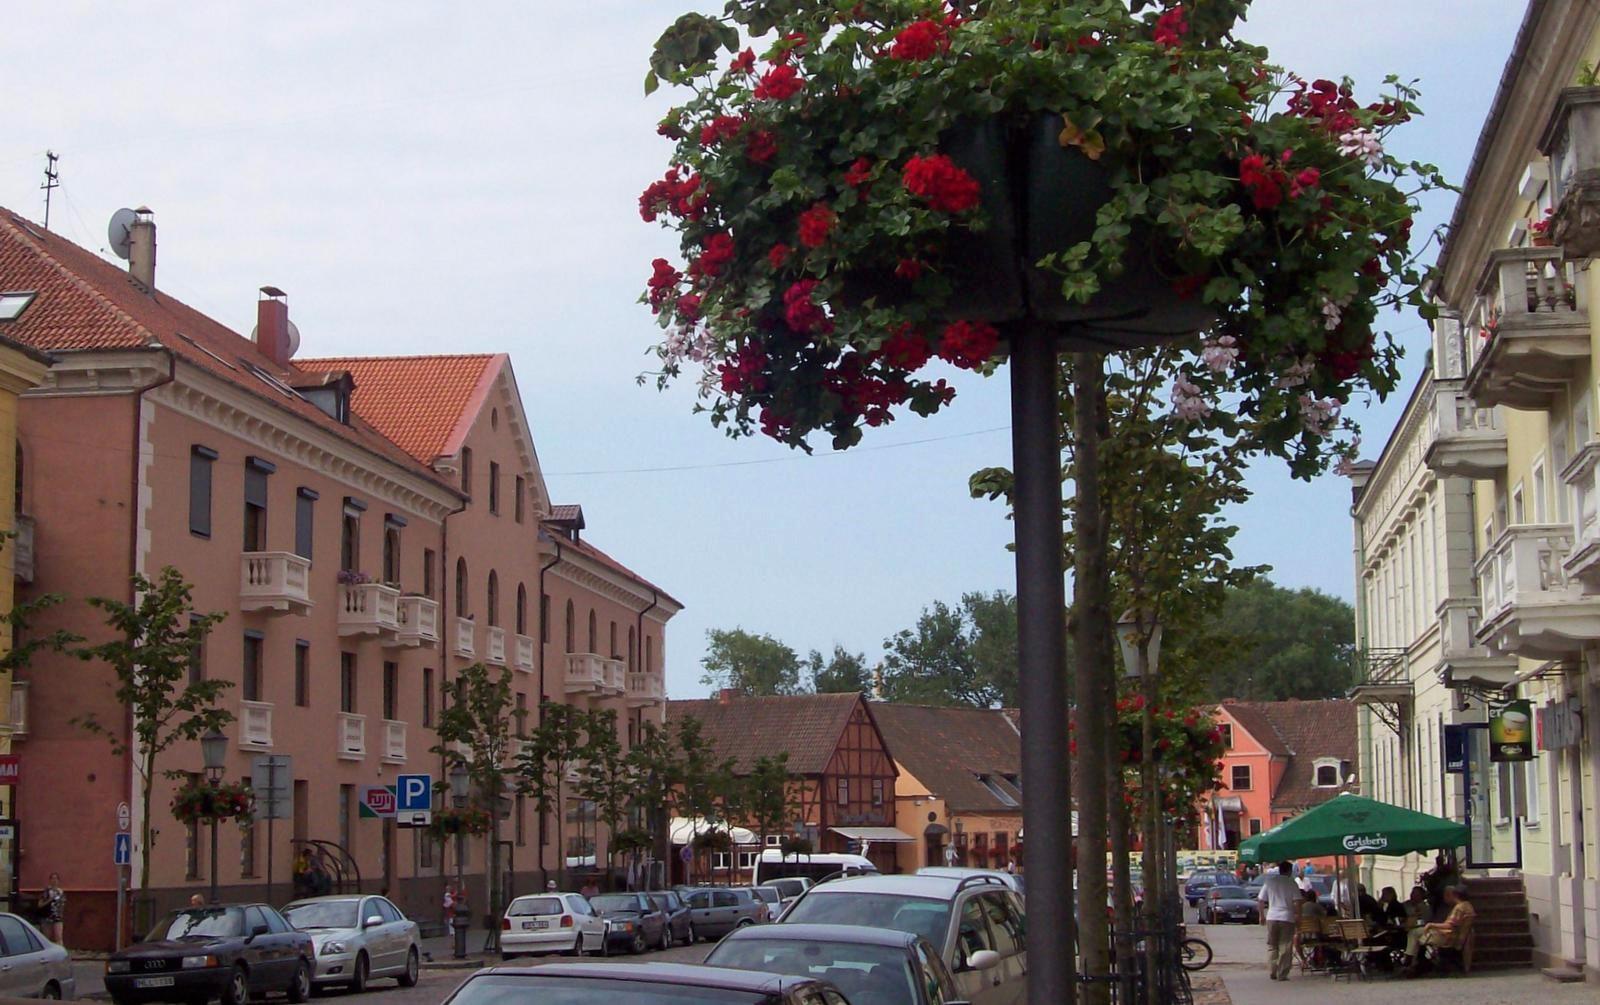 Marktstraße in Memel